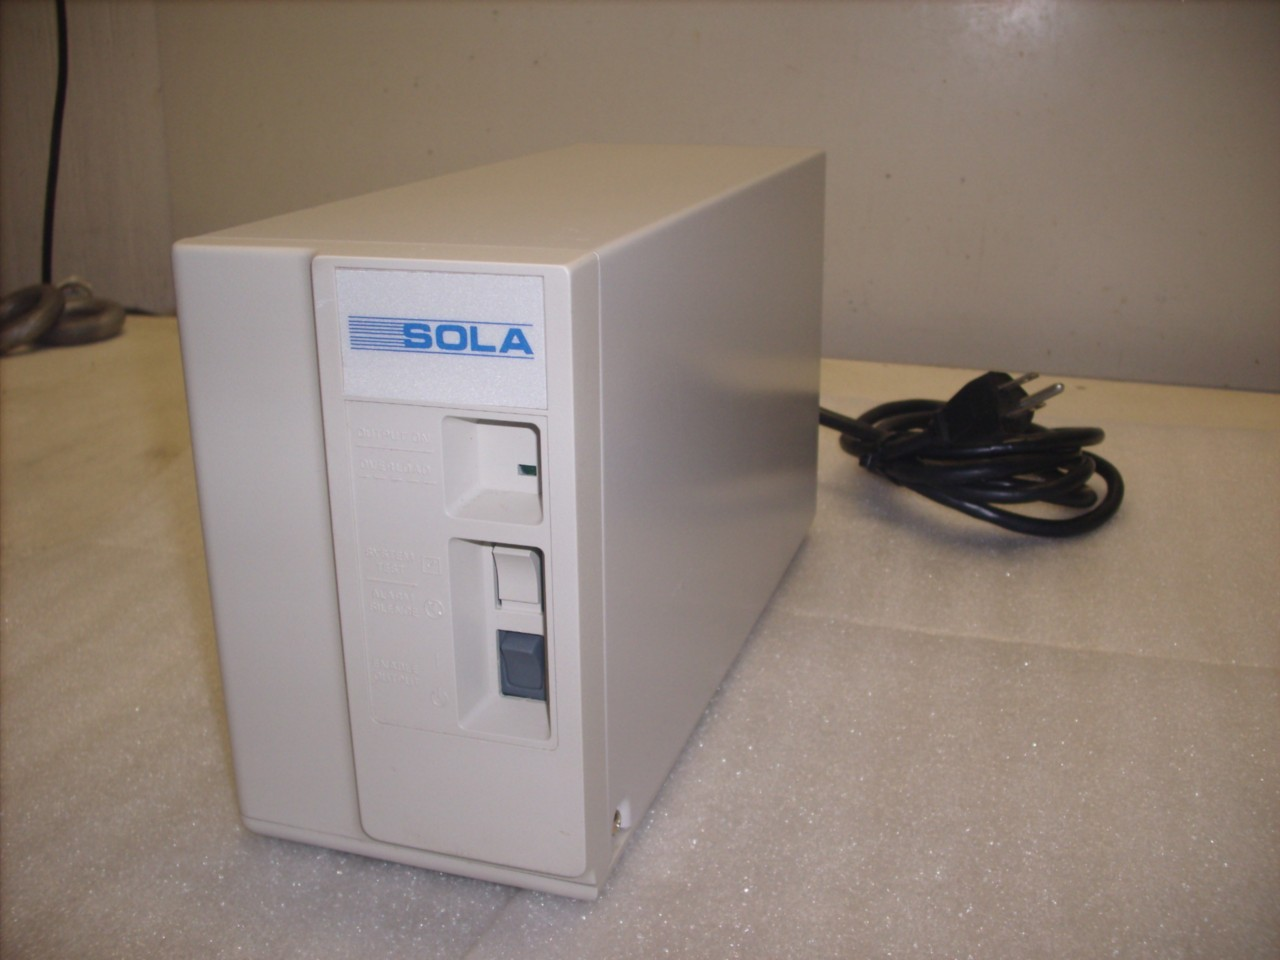 SOLA UPS 400 VA - Uninterruptible Power Supply Cat# 30-400 ***Price  Reduced***   Daves Industrial Surplus LLC